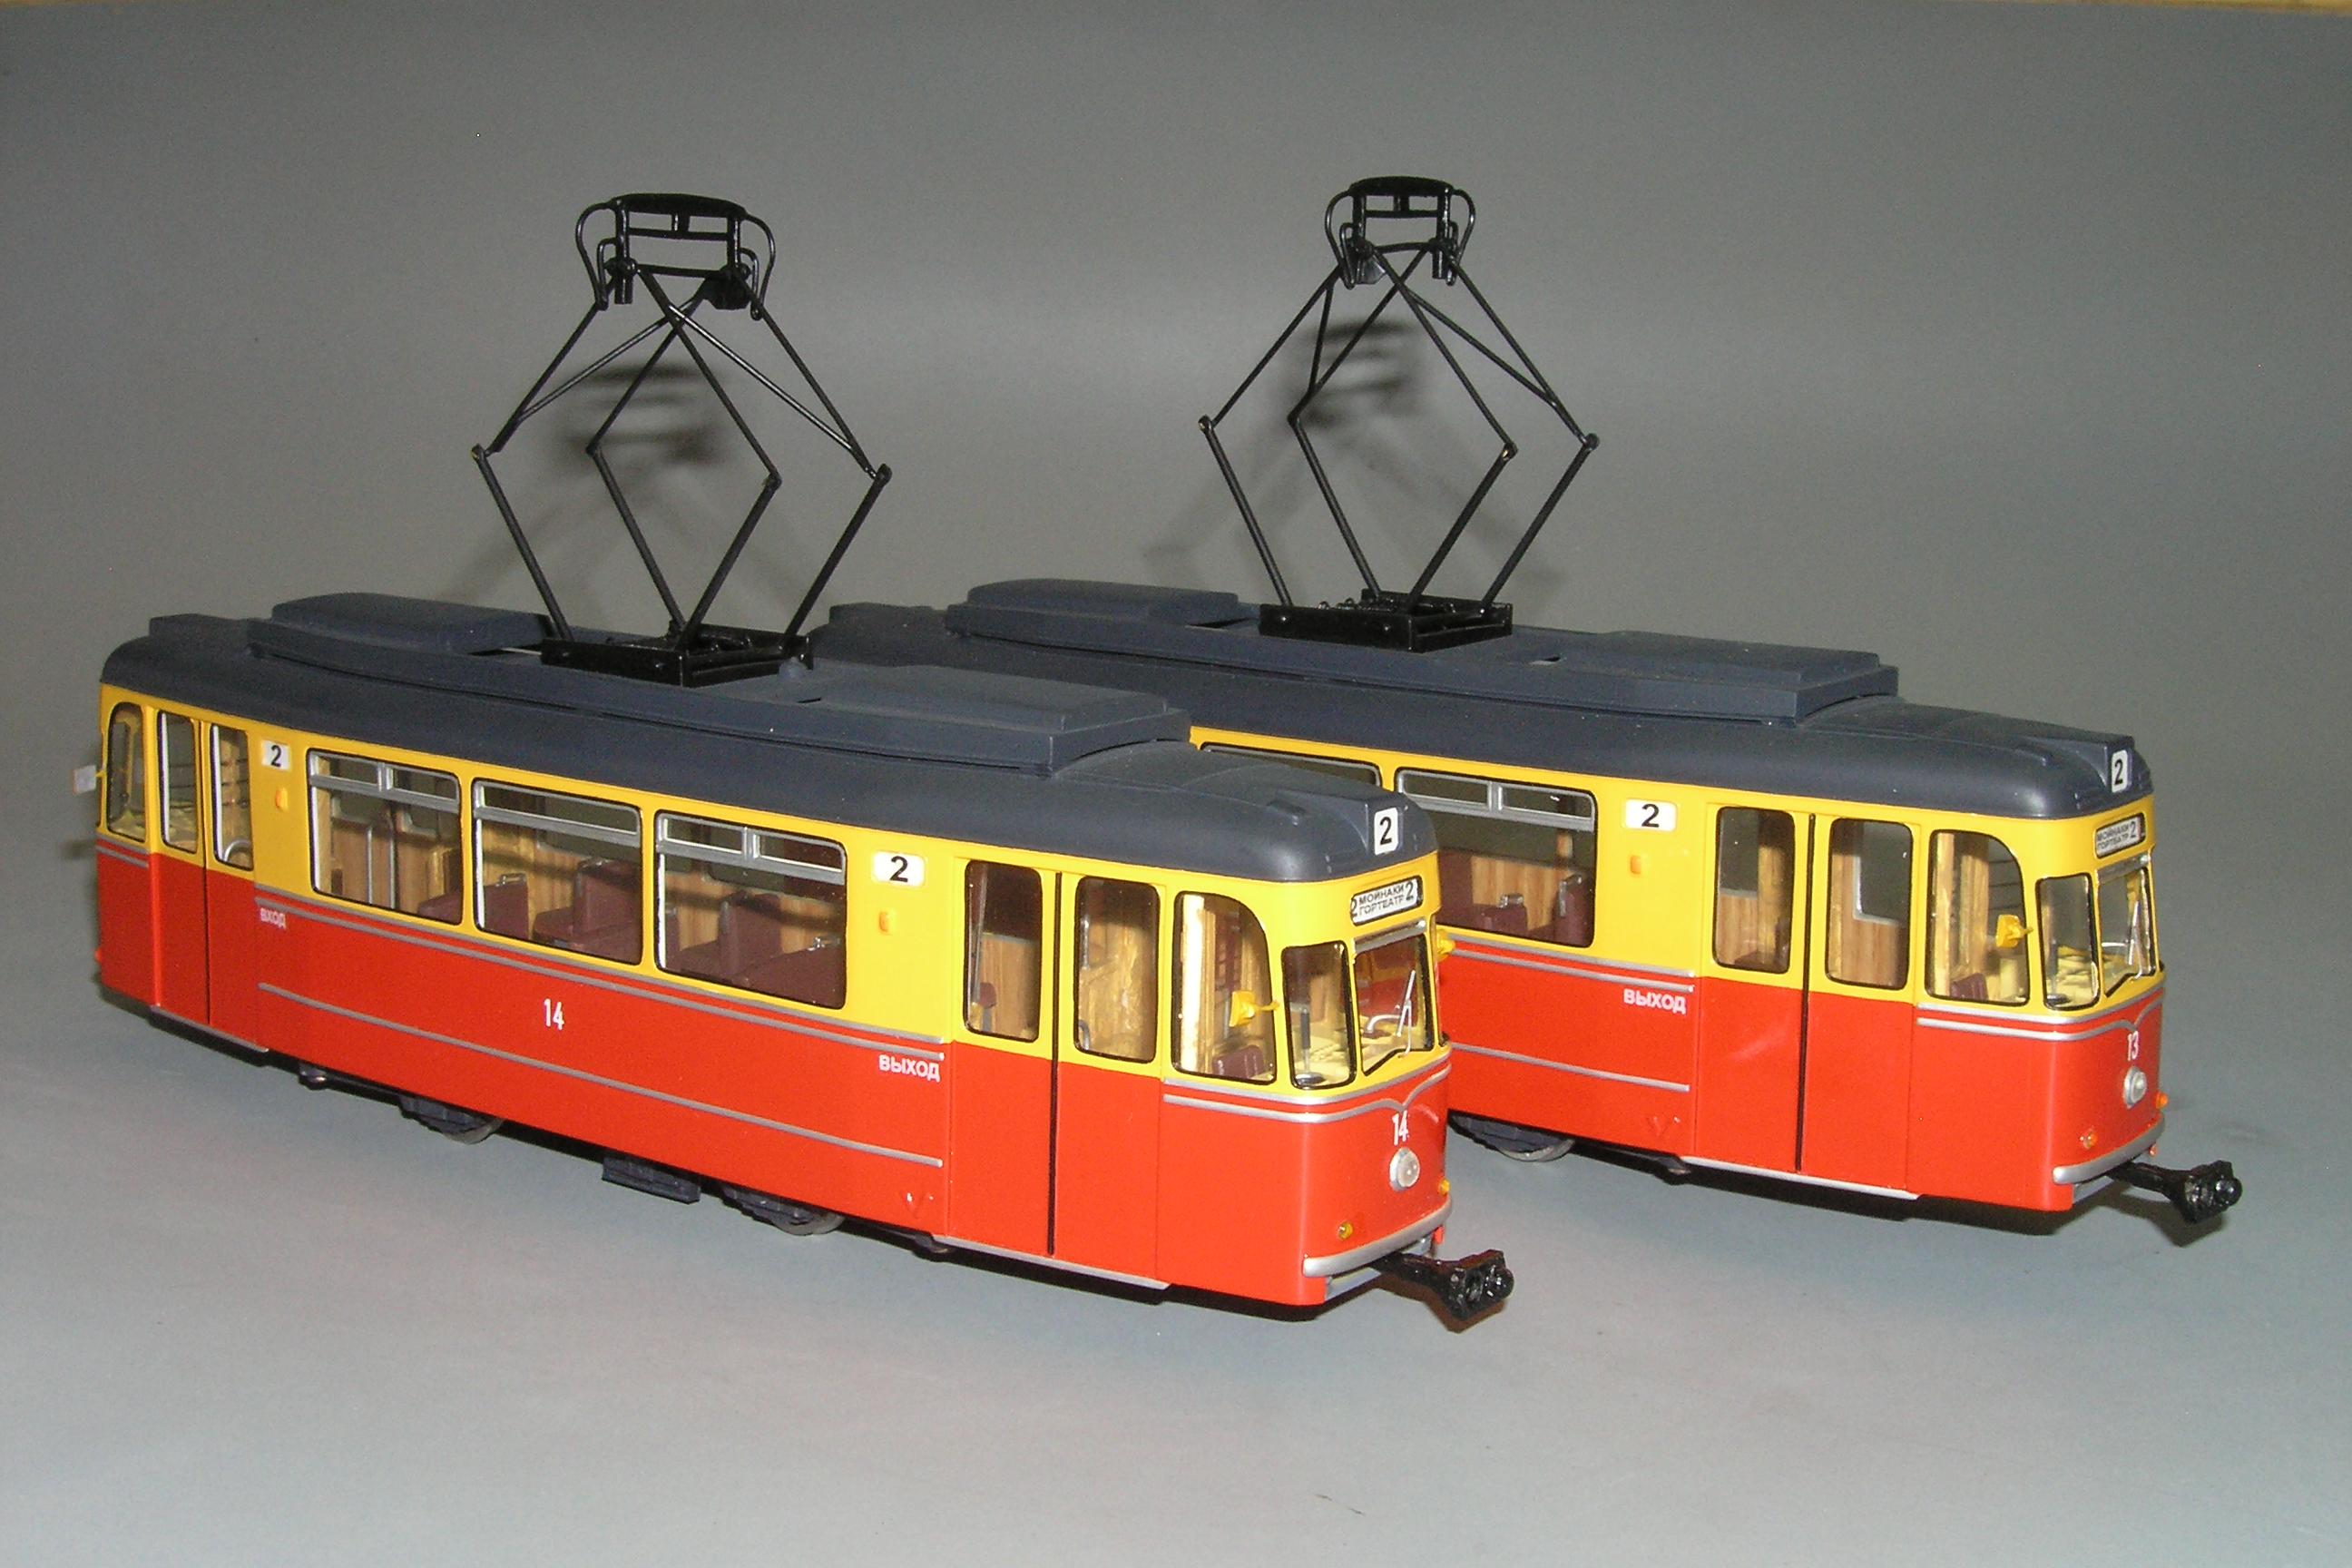 W5-97.2